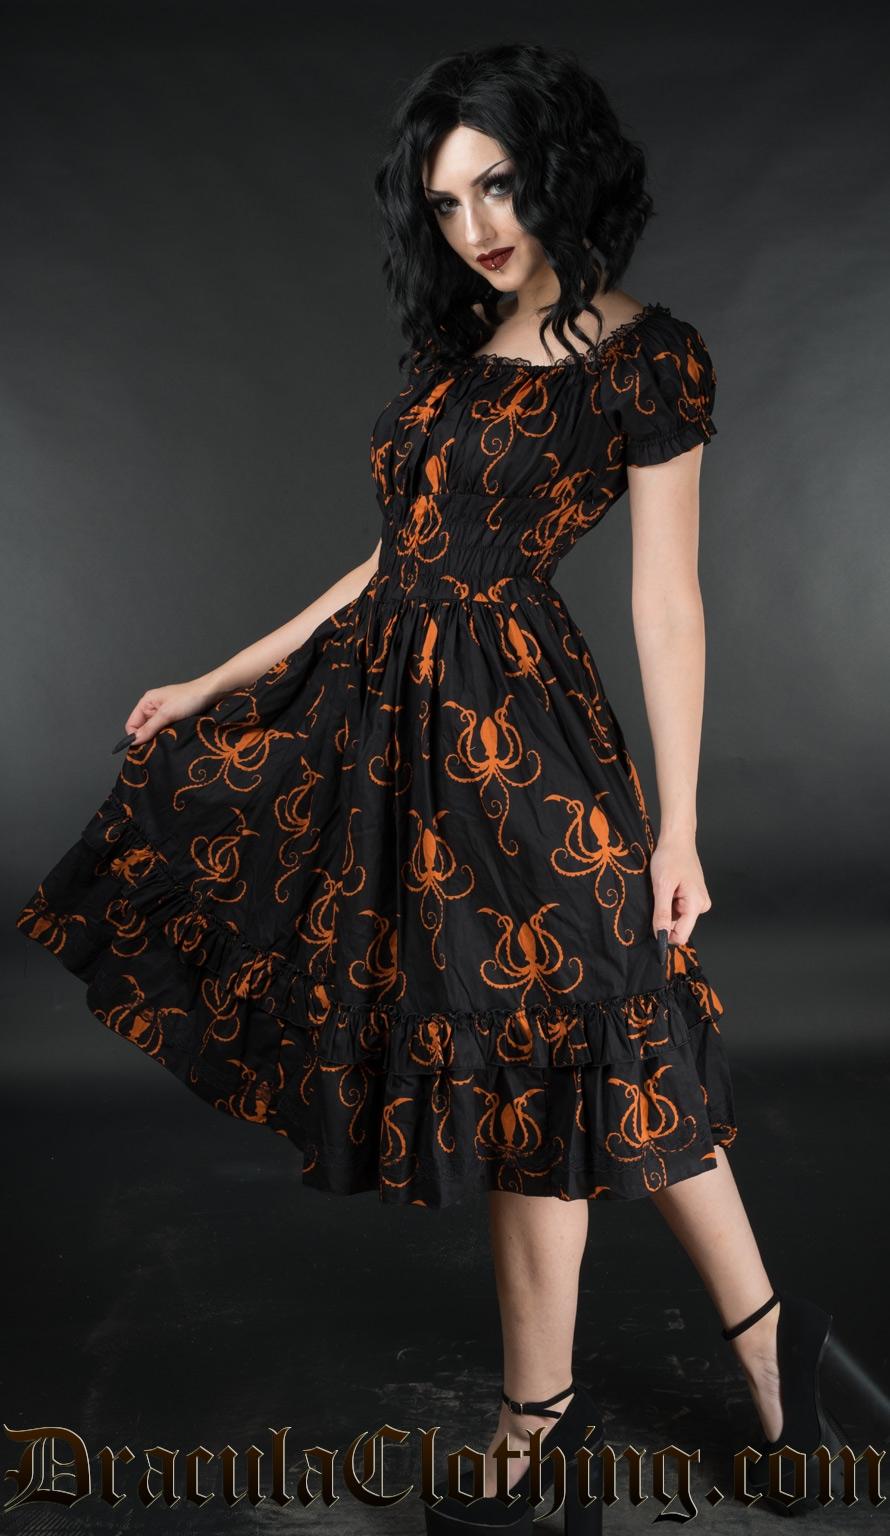 Octopus Gothabilly Dress